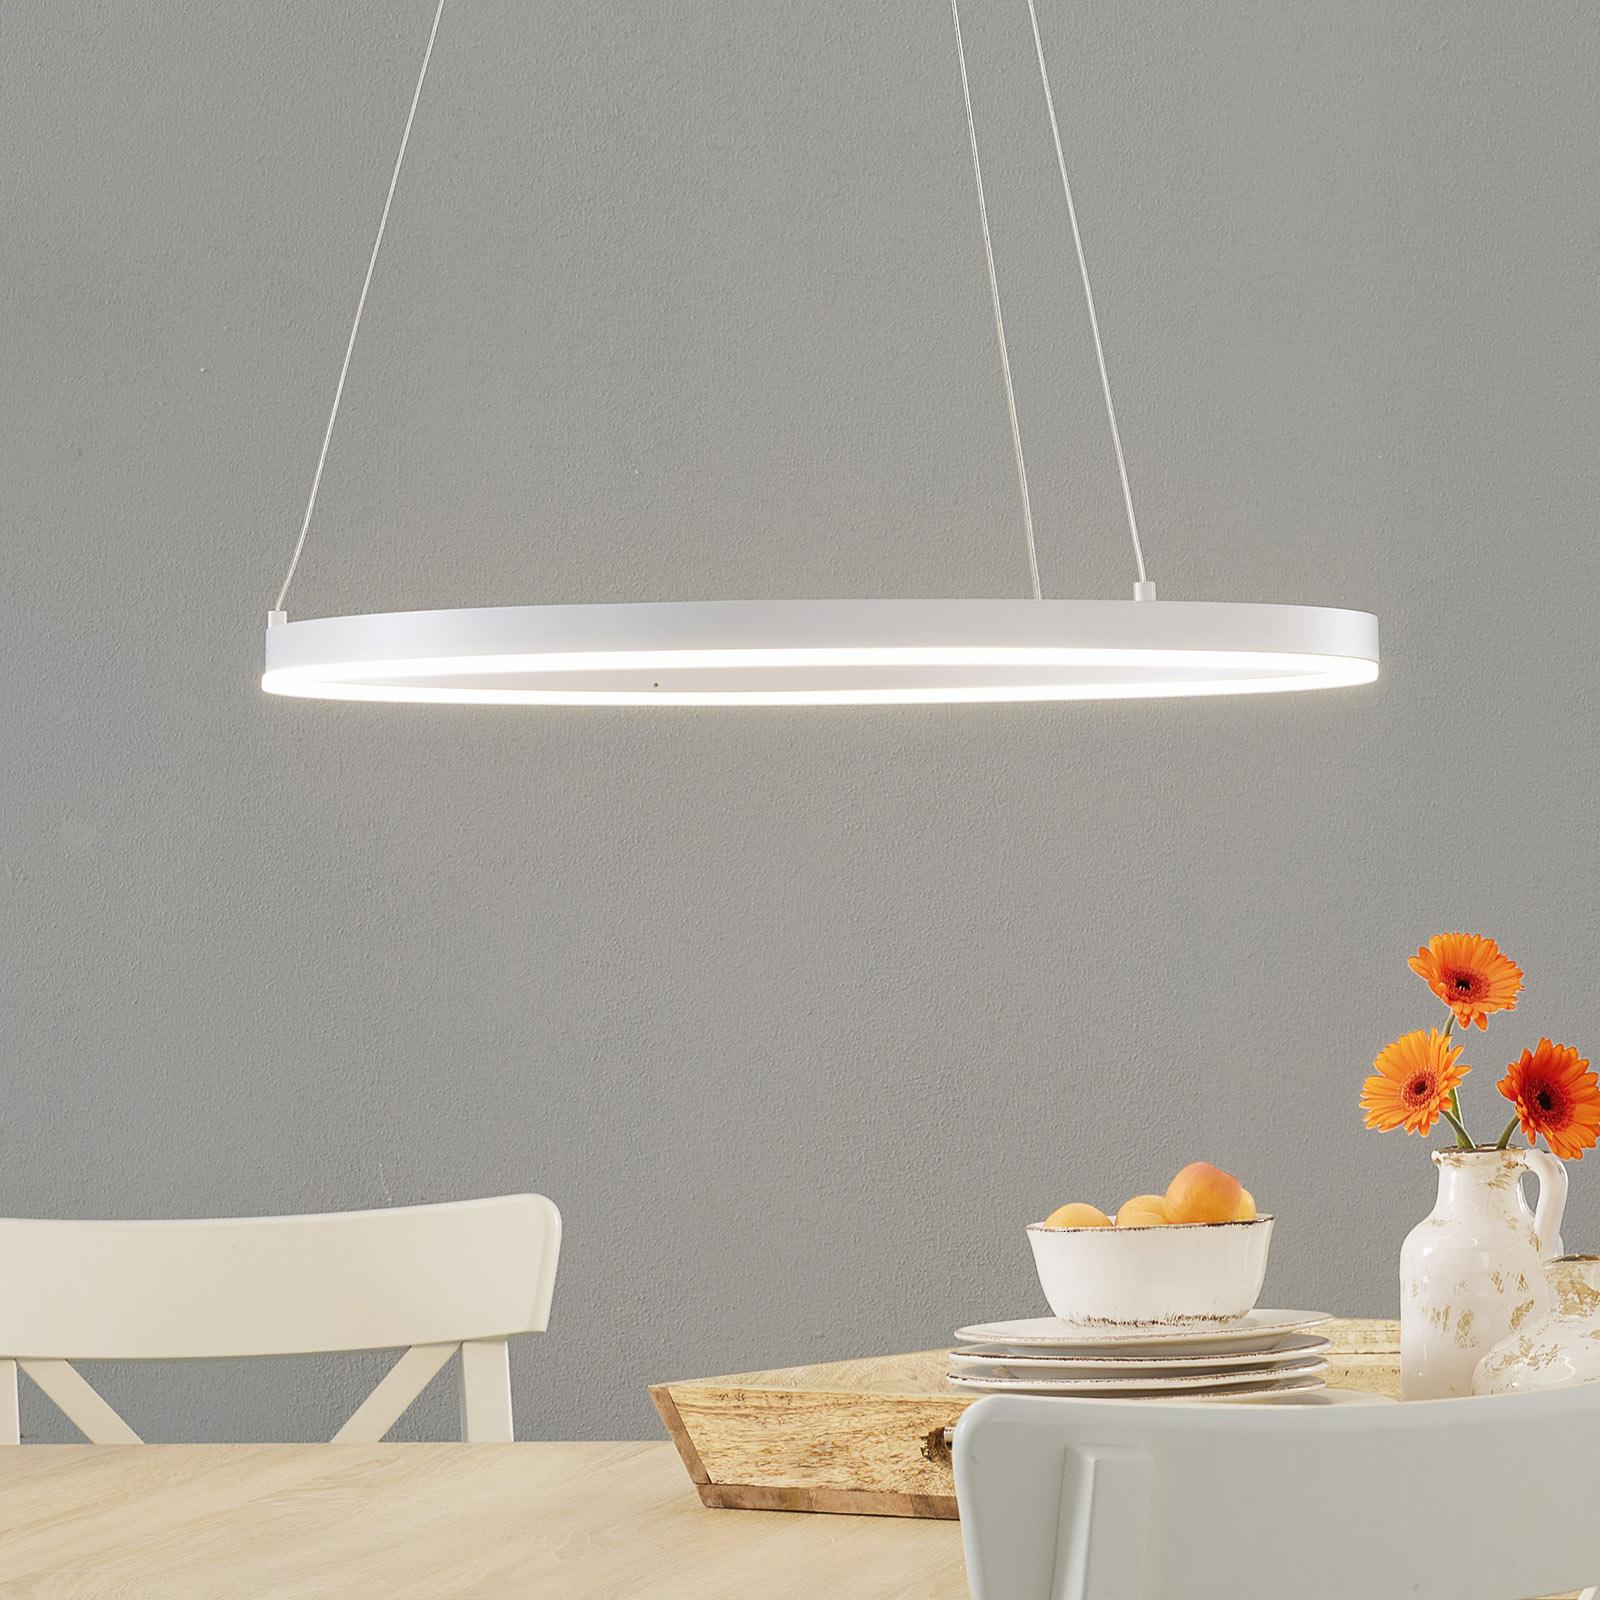 LED-pendellampe Vaasa, dimbar, hvit